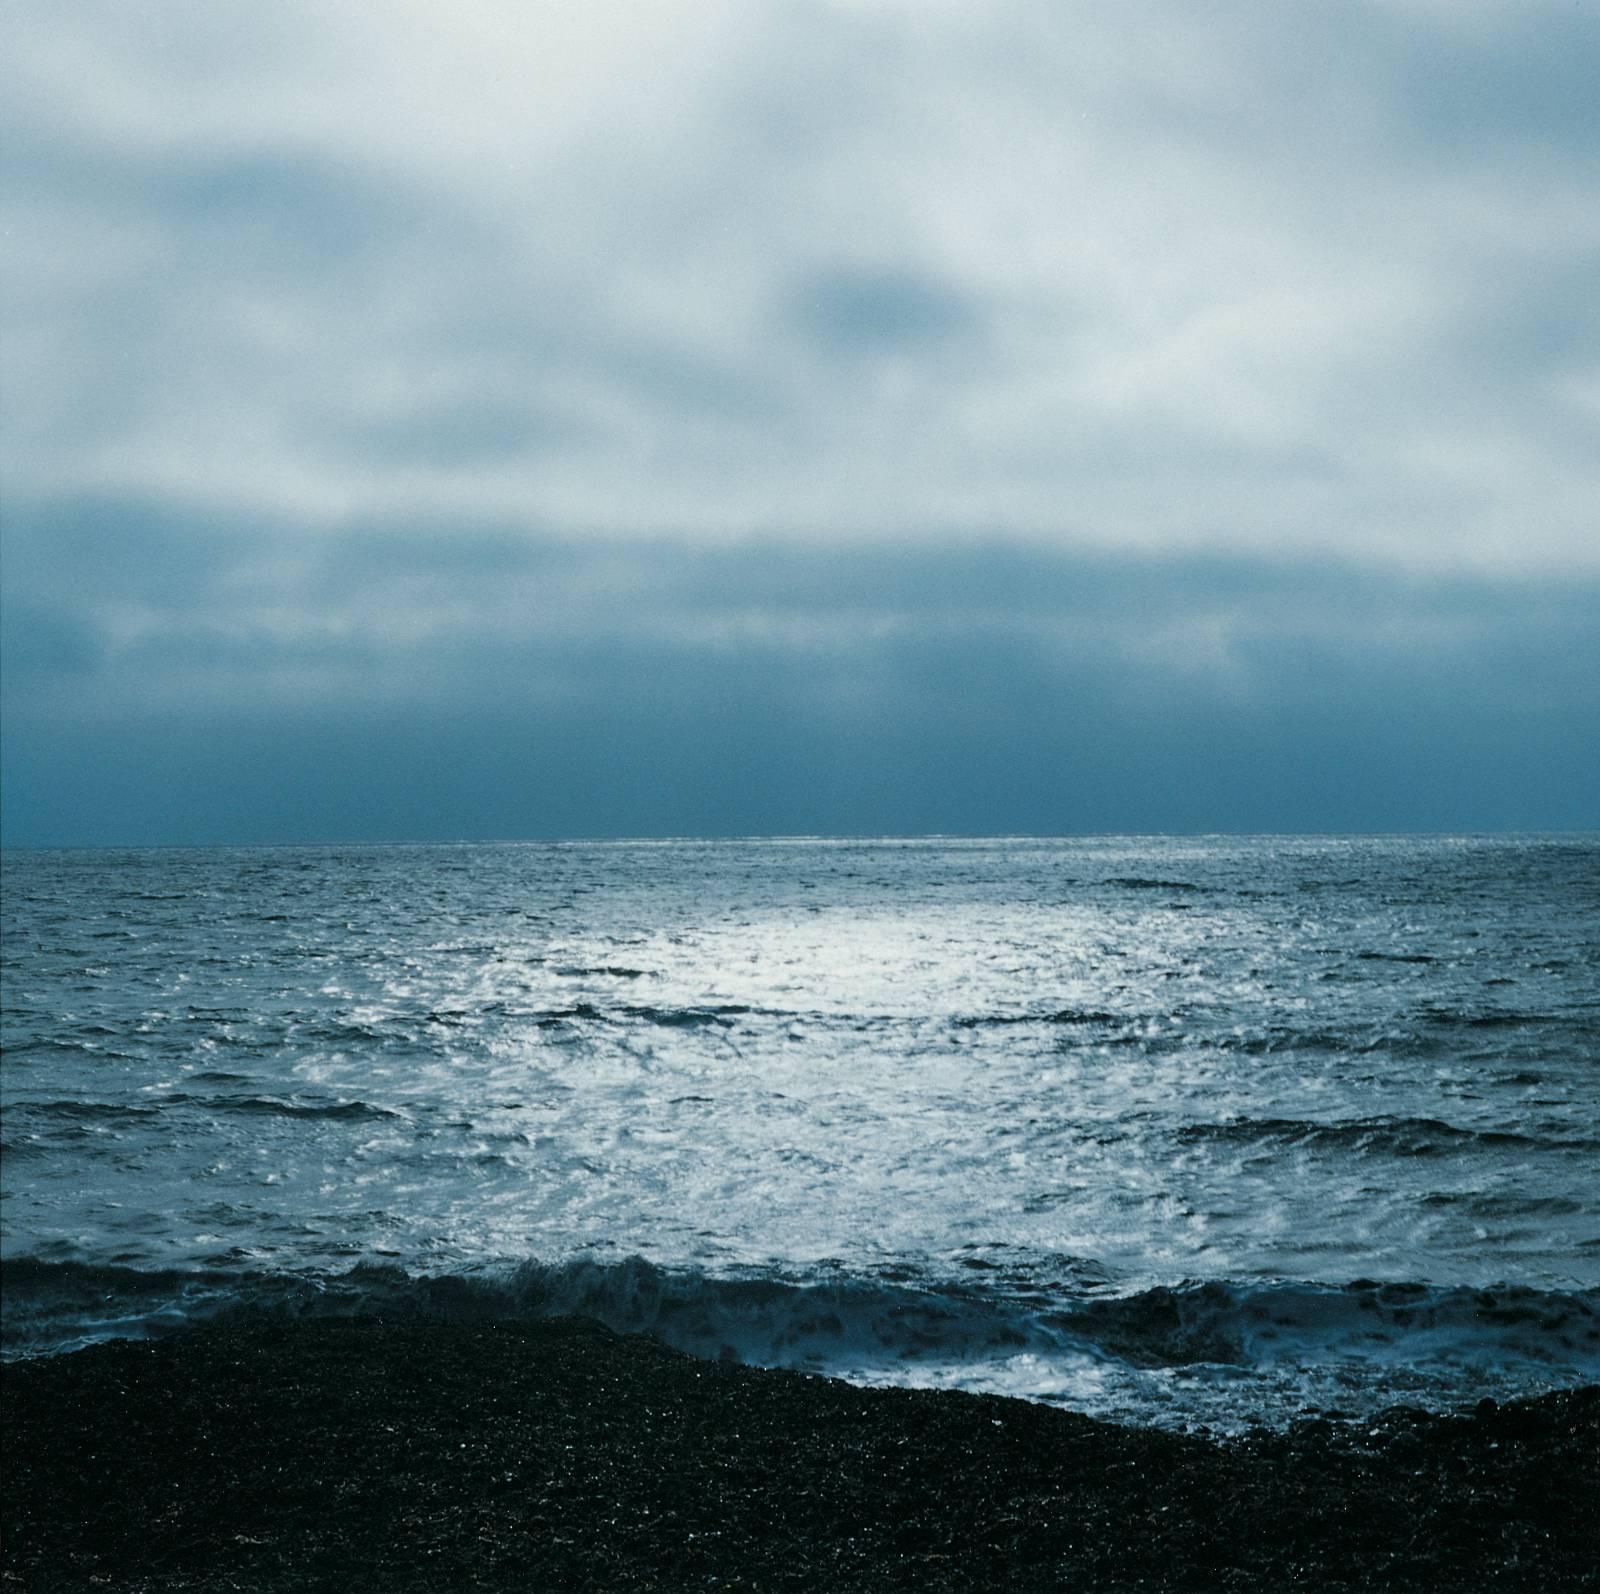 The Sea, 2002, C-print, 110 x 110 cm